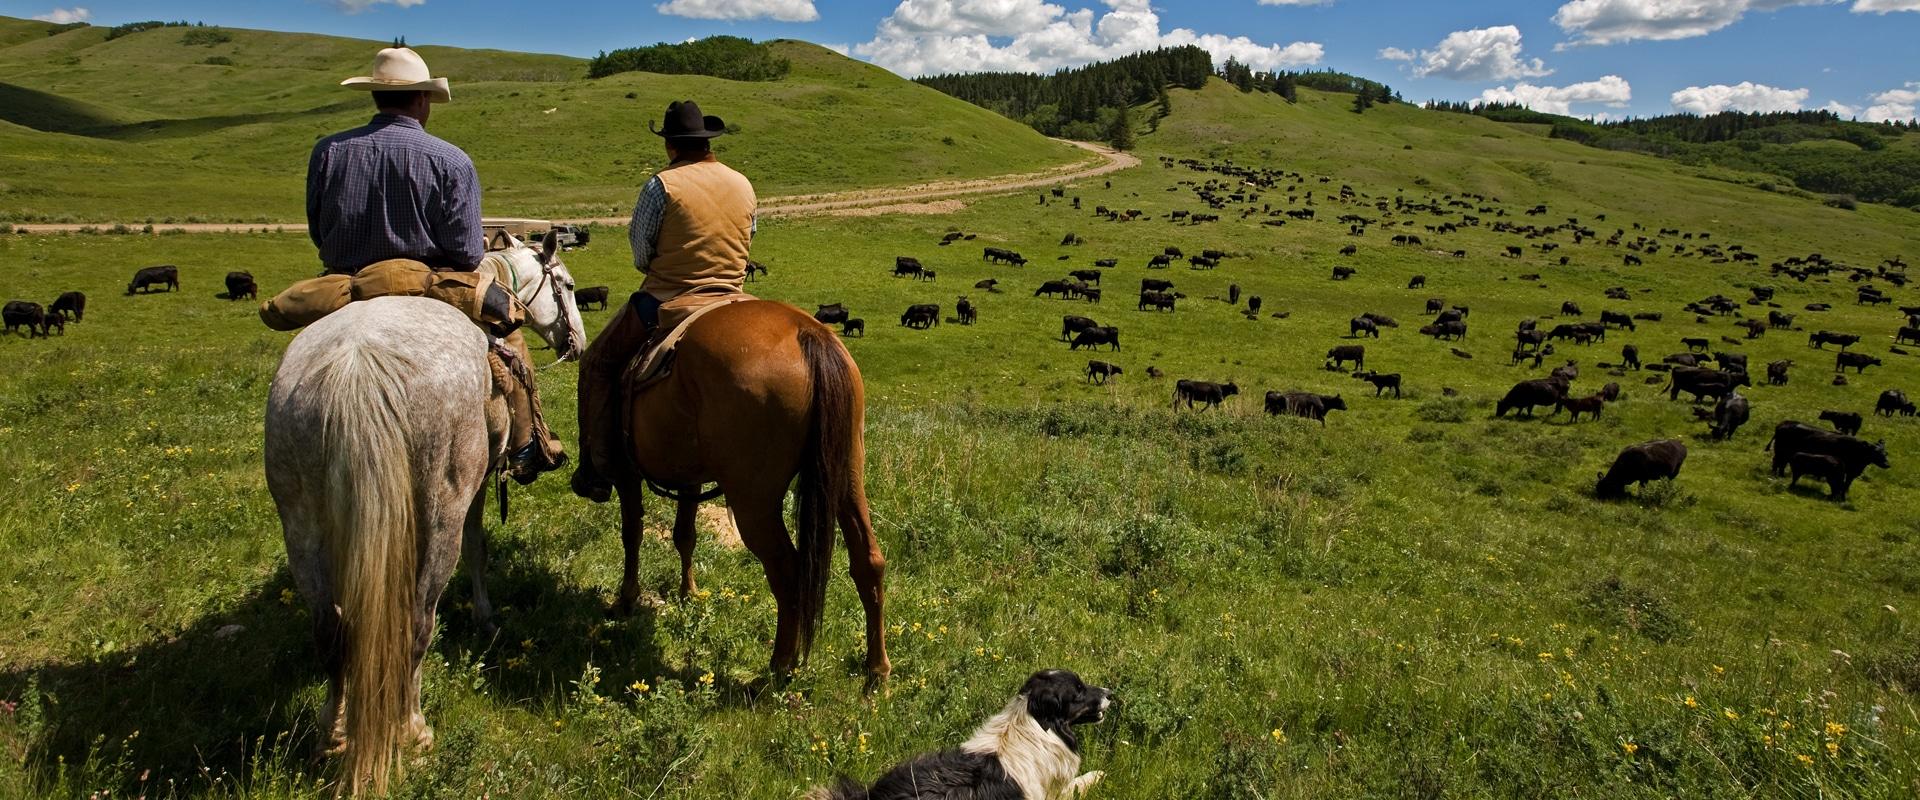 Cowboys And Dog Herding Cattle Lrg Header High Plains